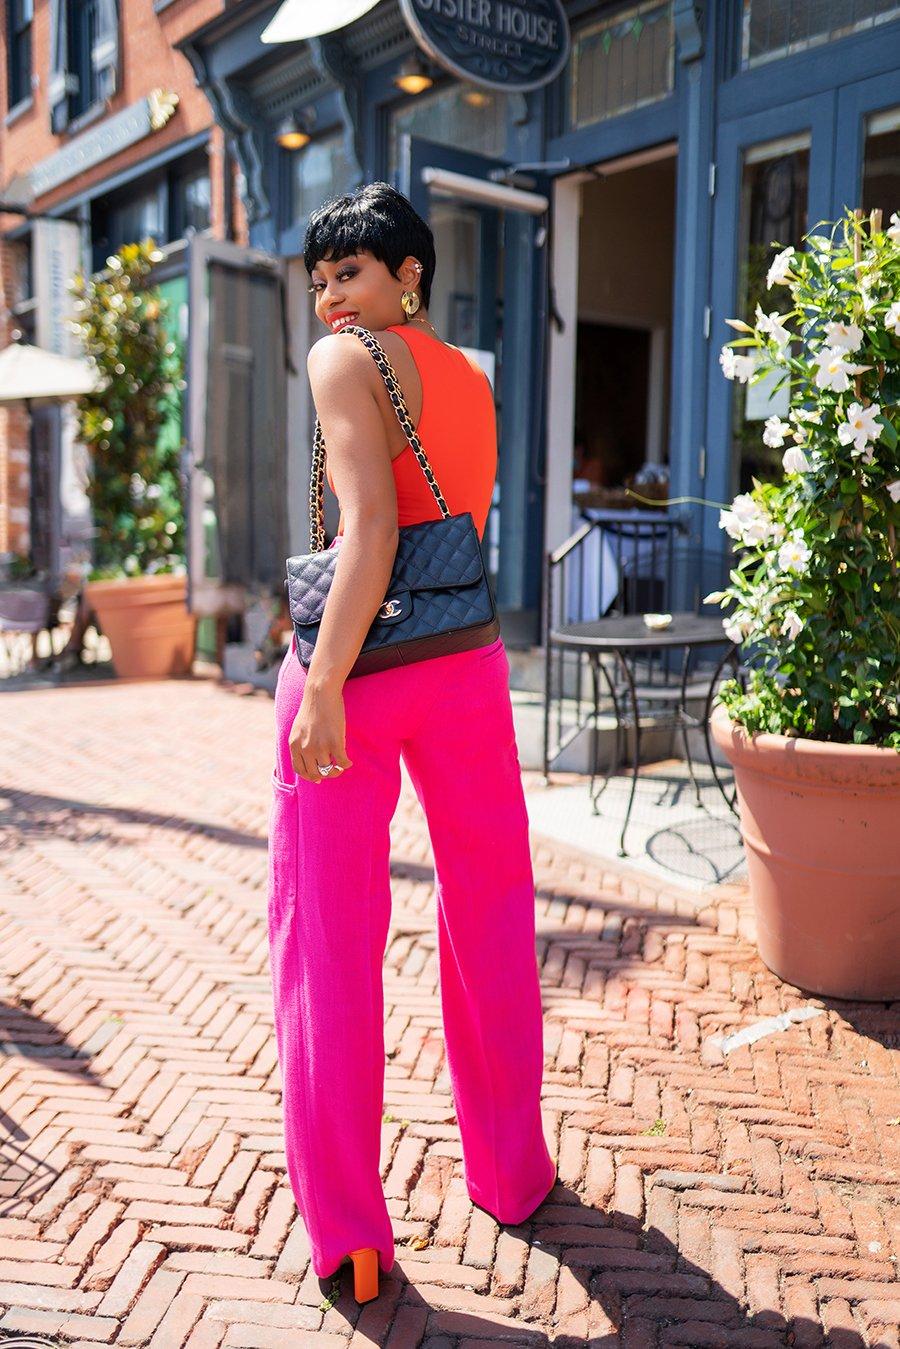 Summer-bold-colors-pinkl-orange-mix